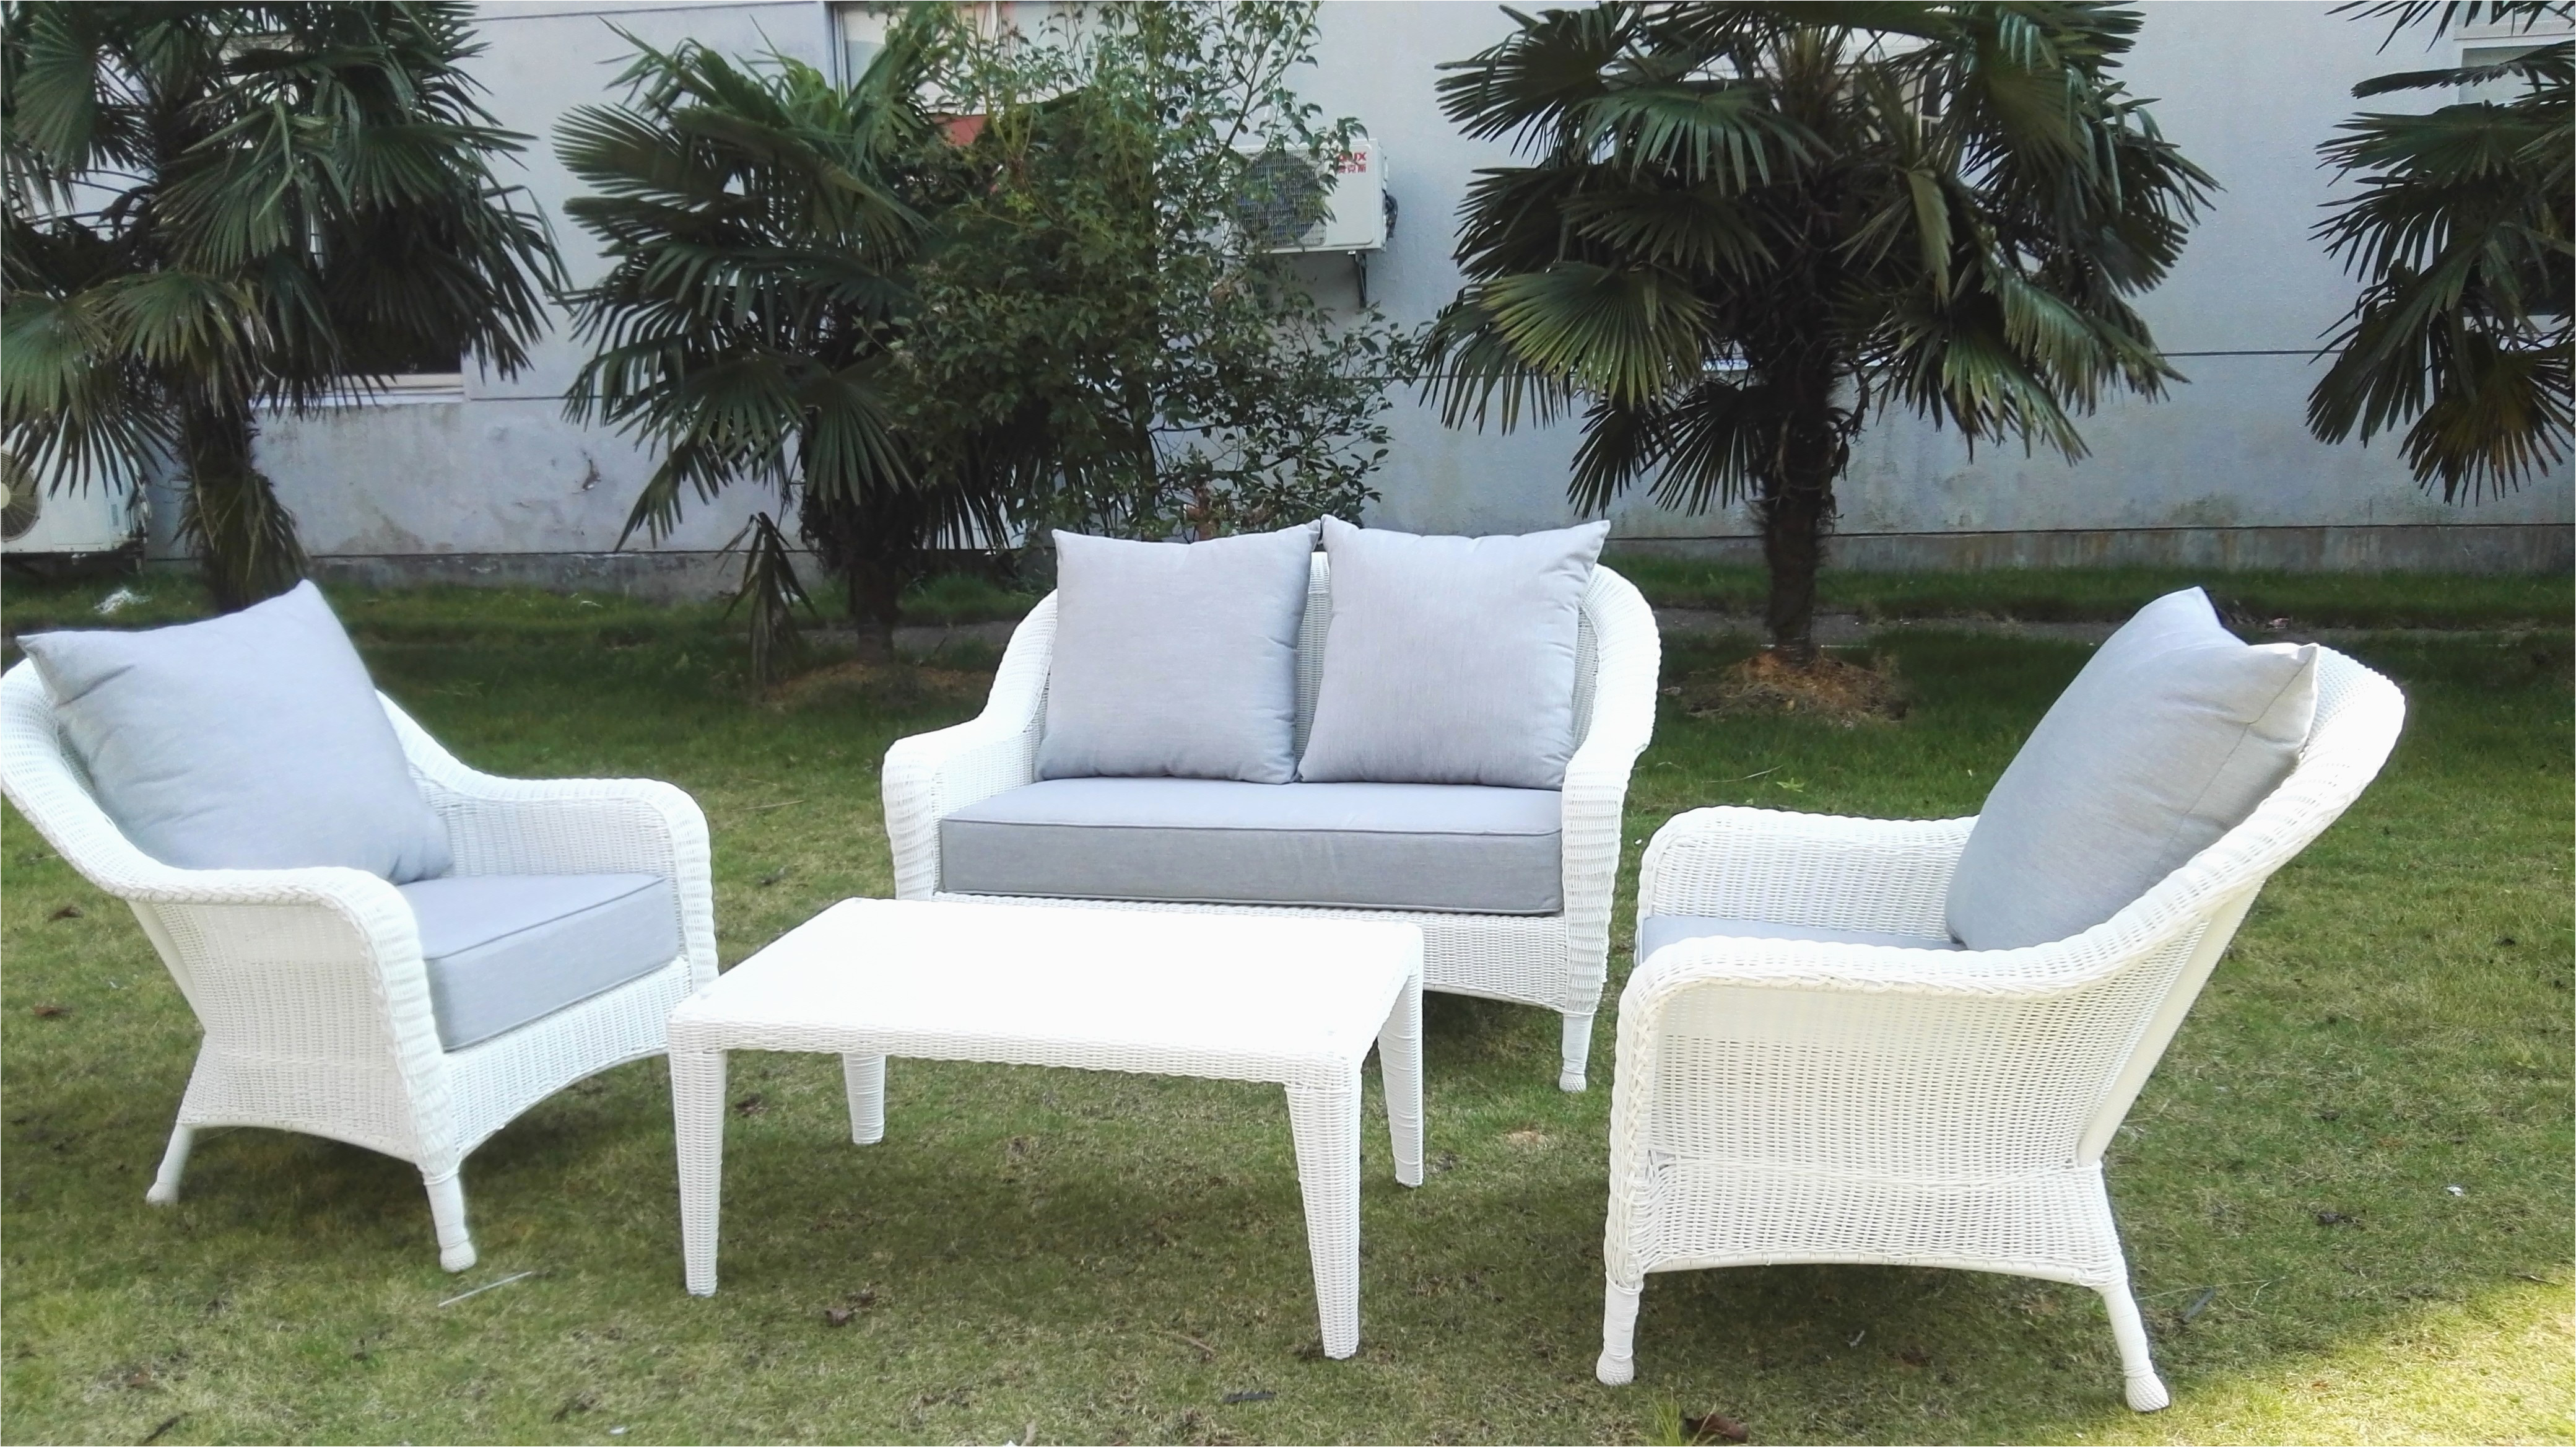 charming ikea tampa home furnishings tampa fl or outdoor furniture tampa inspirational outdoor furniture tampa